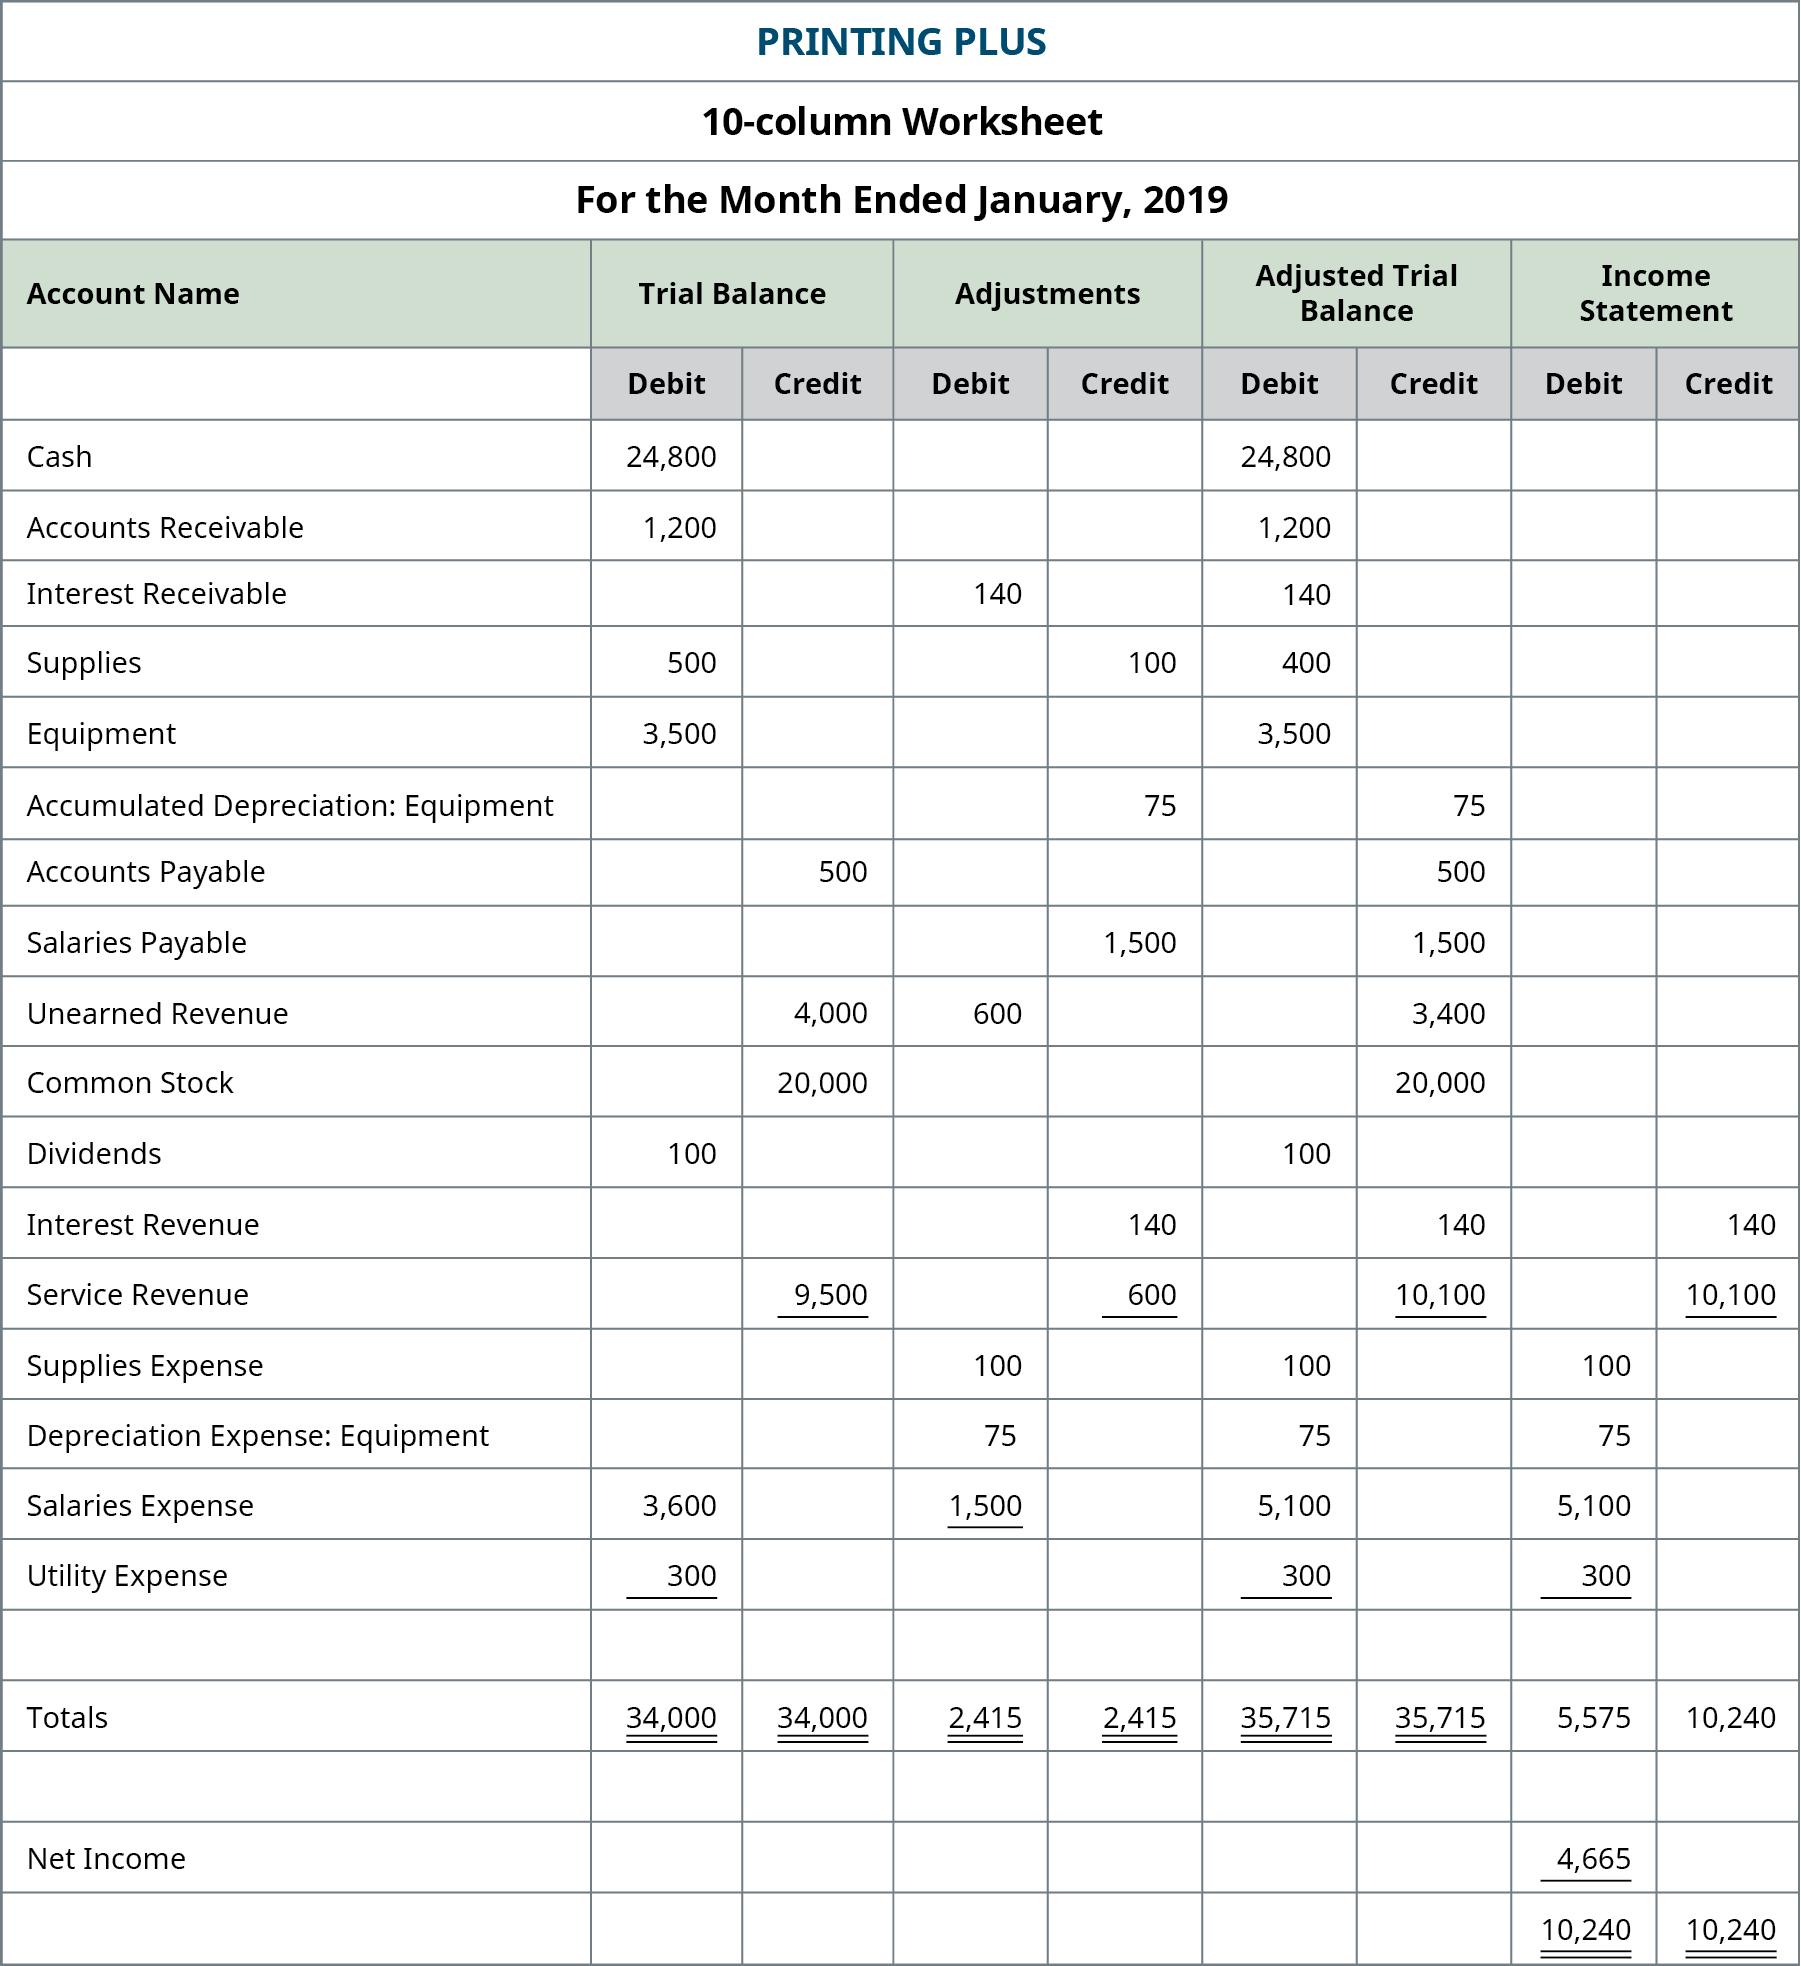 Excerpt from Printing Plus worksheet, adding the Income Statement columns. Credit column: Interest Revenue 140; Service Revenue 10,100; Total Credit Column 10,240. Debit column: Supplies Expense 100; Depreciation Expense: Equipment 75; Salaries Expense 5,100; Utility Expense 300; Sub-Total Debit Column 5,575; Net Income 4,665; Total Debit Column 10,240.